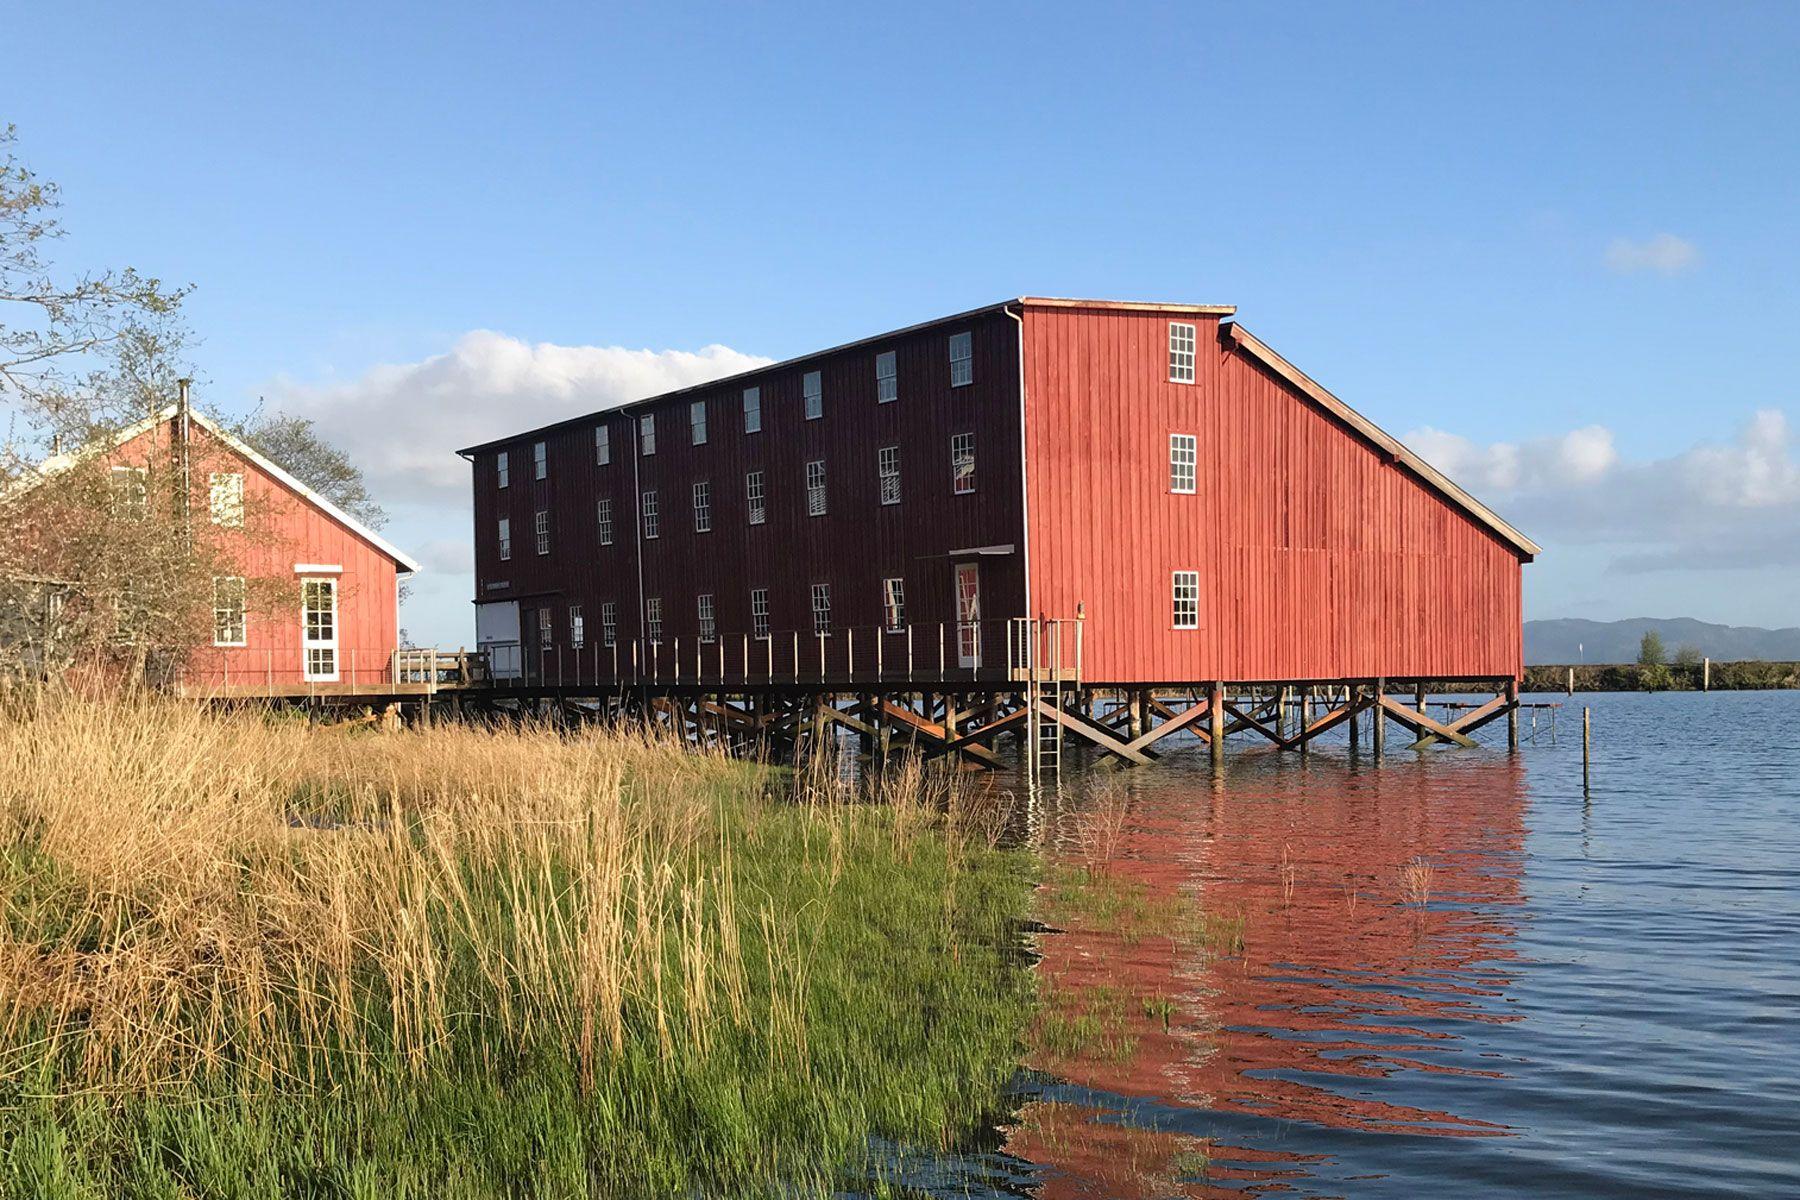 historic, marine, industrial, fishing, waterfront, retreat